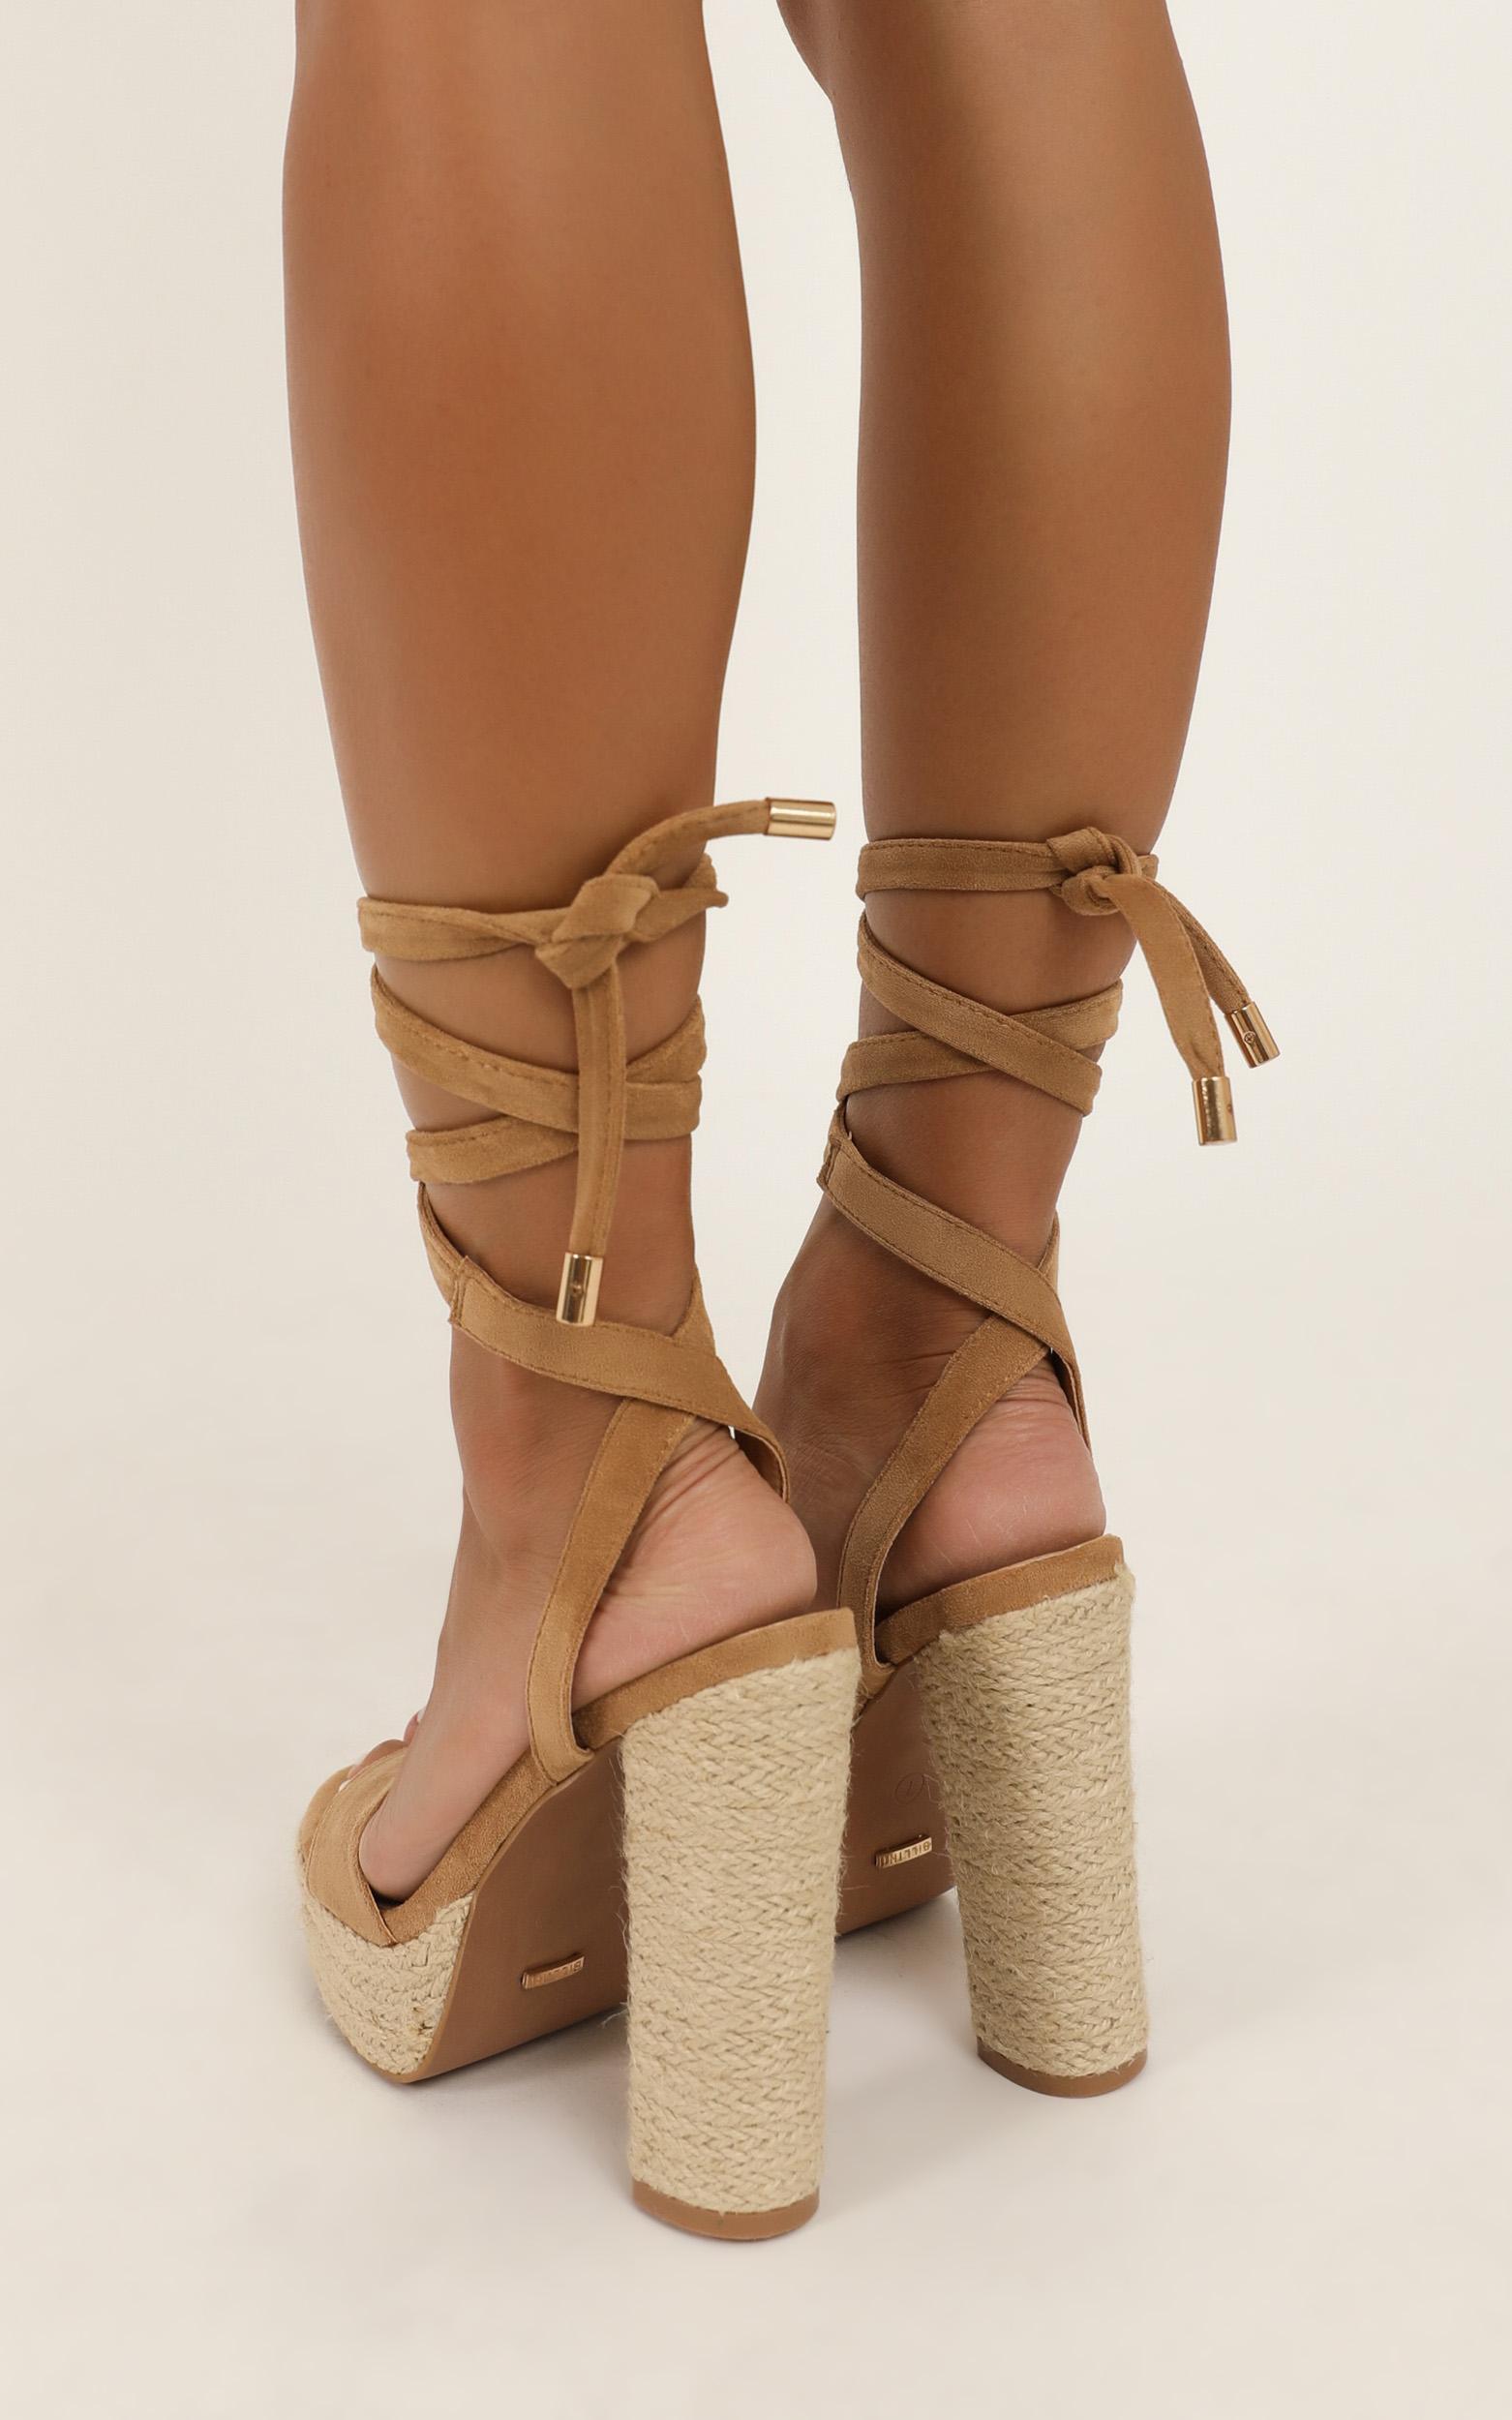 Billini - Emilie heels in camel micro - 10, Camel, hi-res image number null